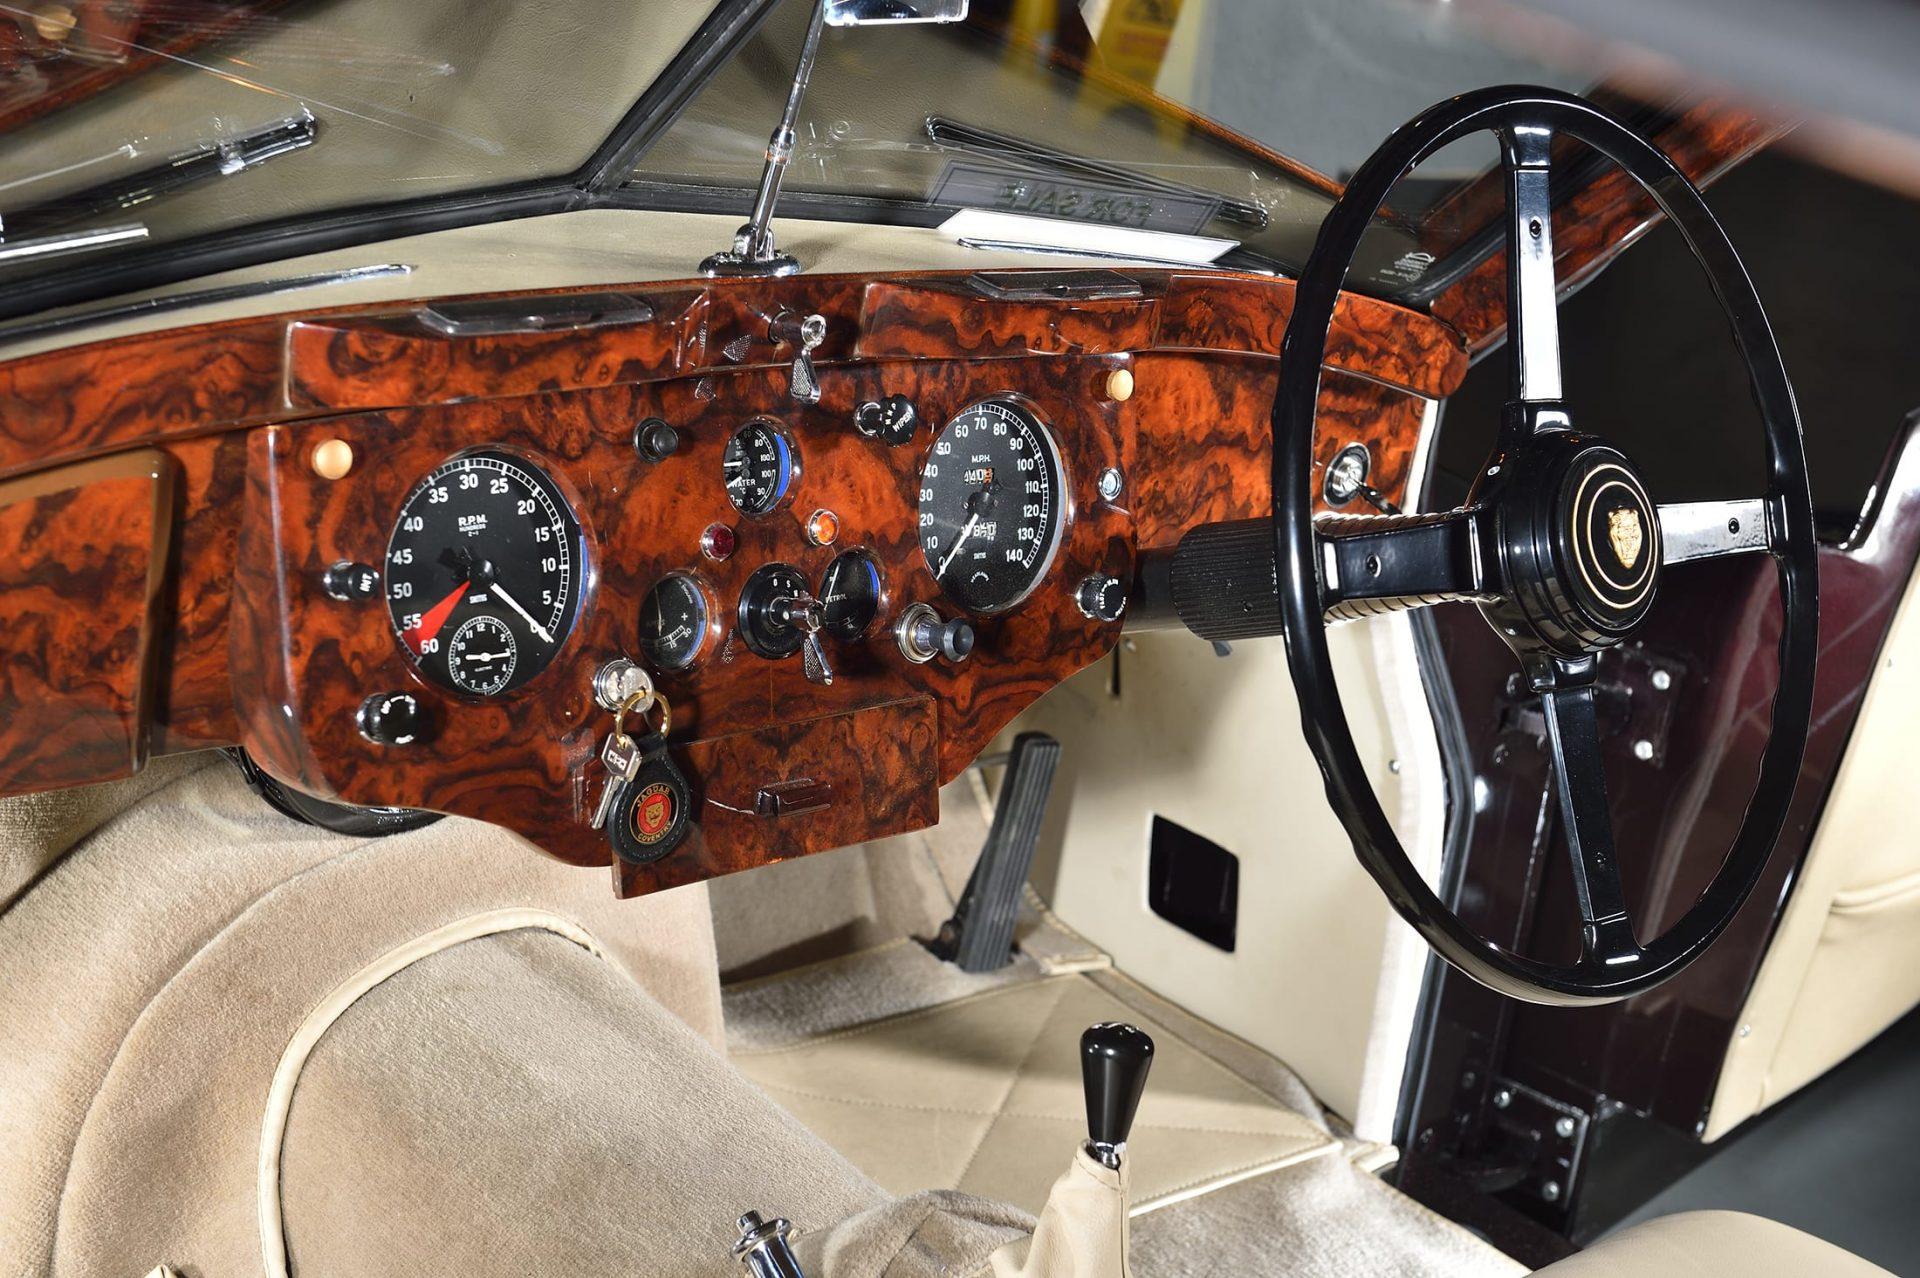 Dashboard and steering wheel in classic Jaguar car